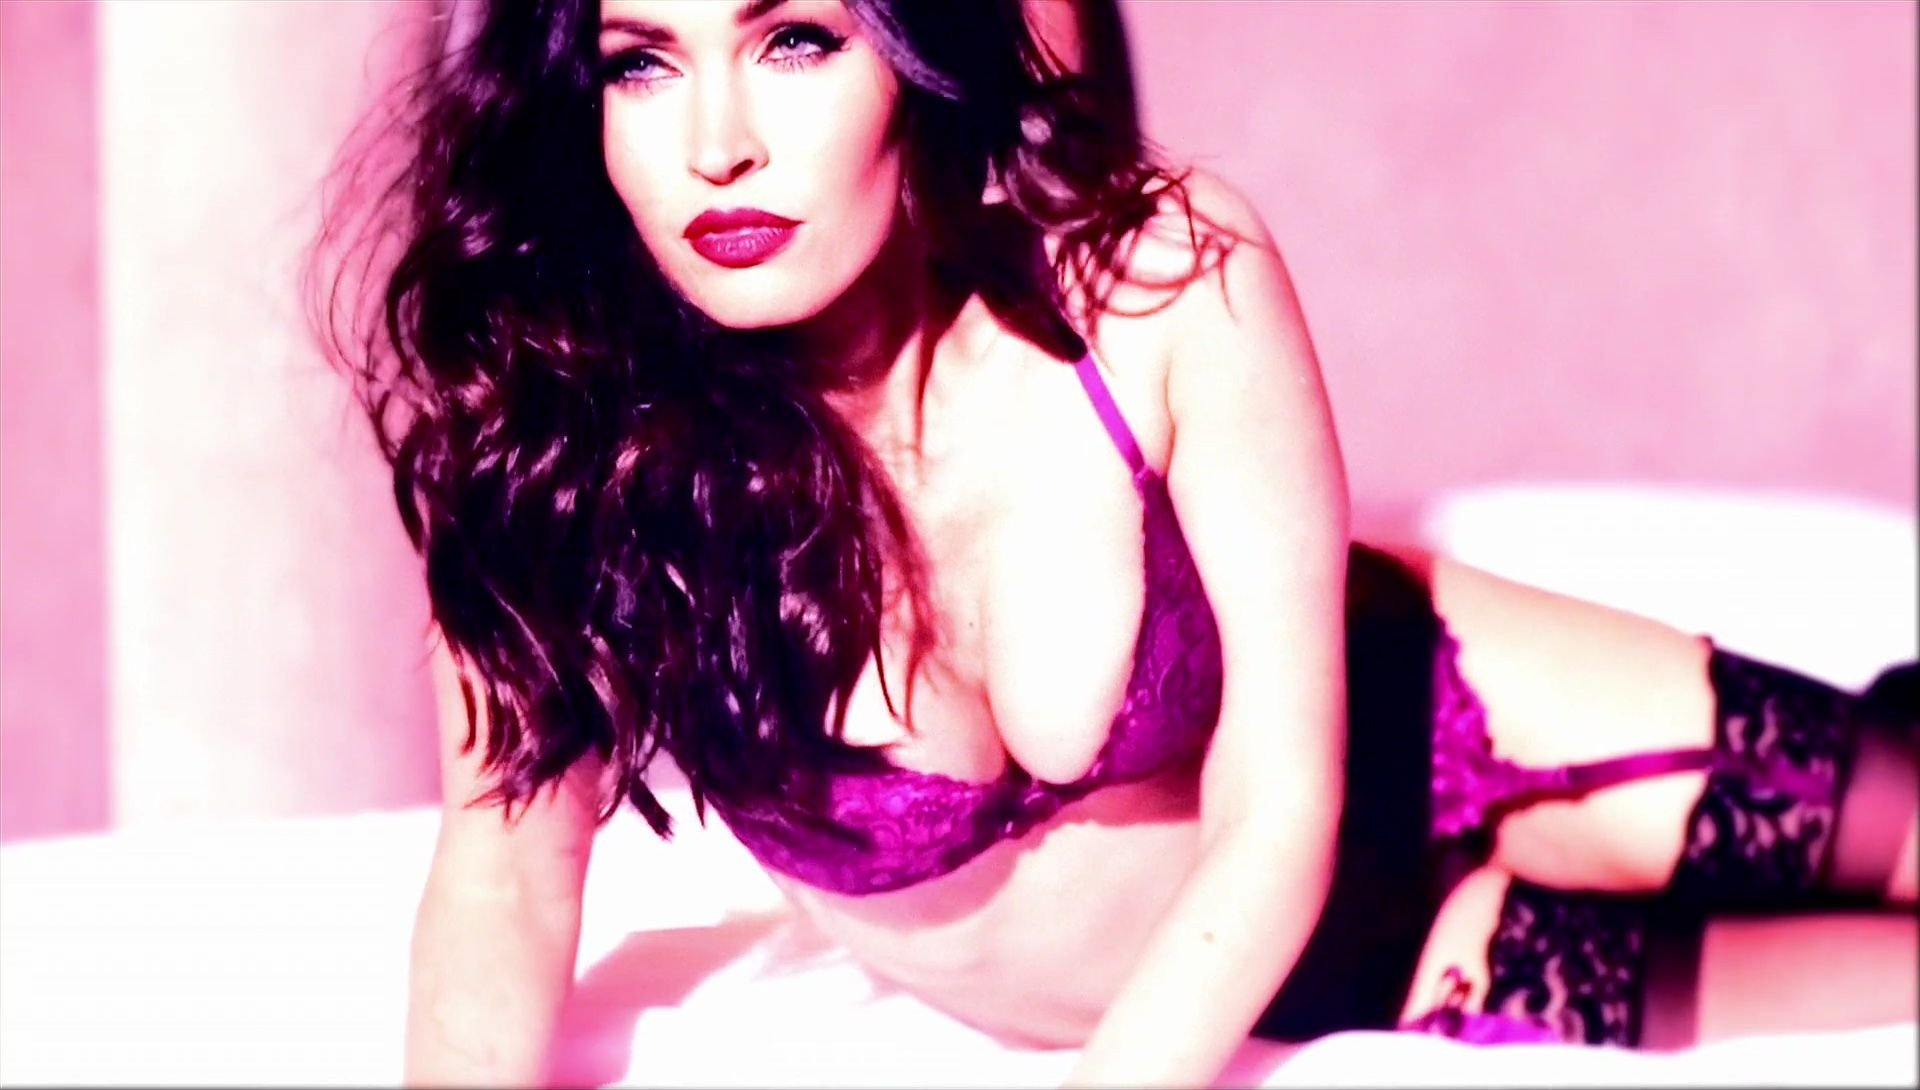 Free Porn Videos Of Megan Fox 69